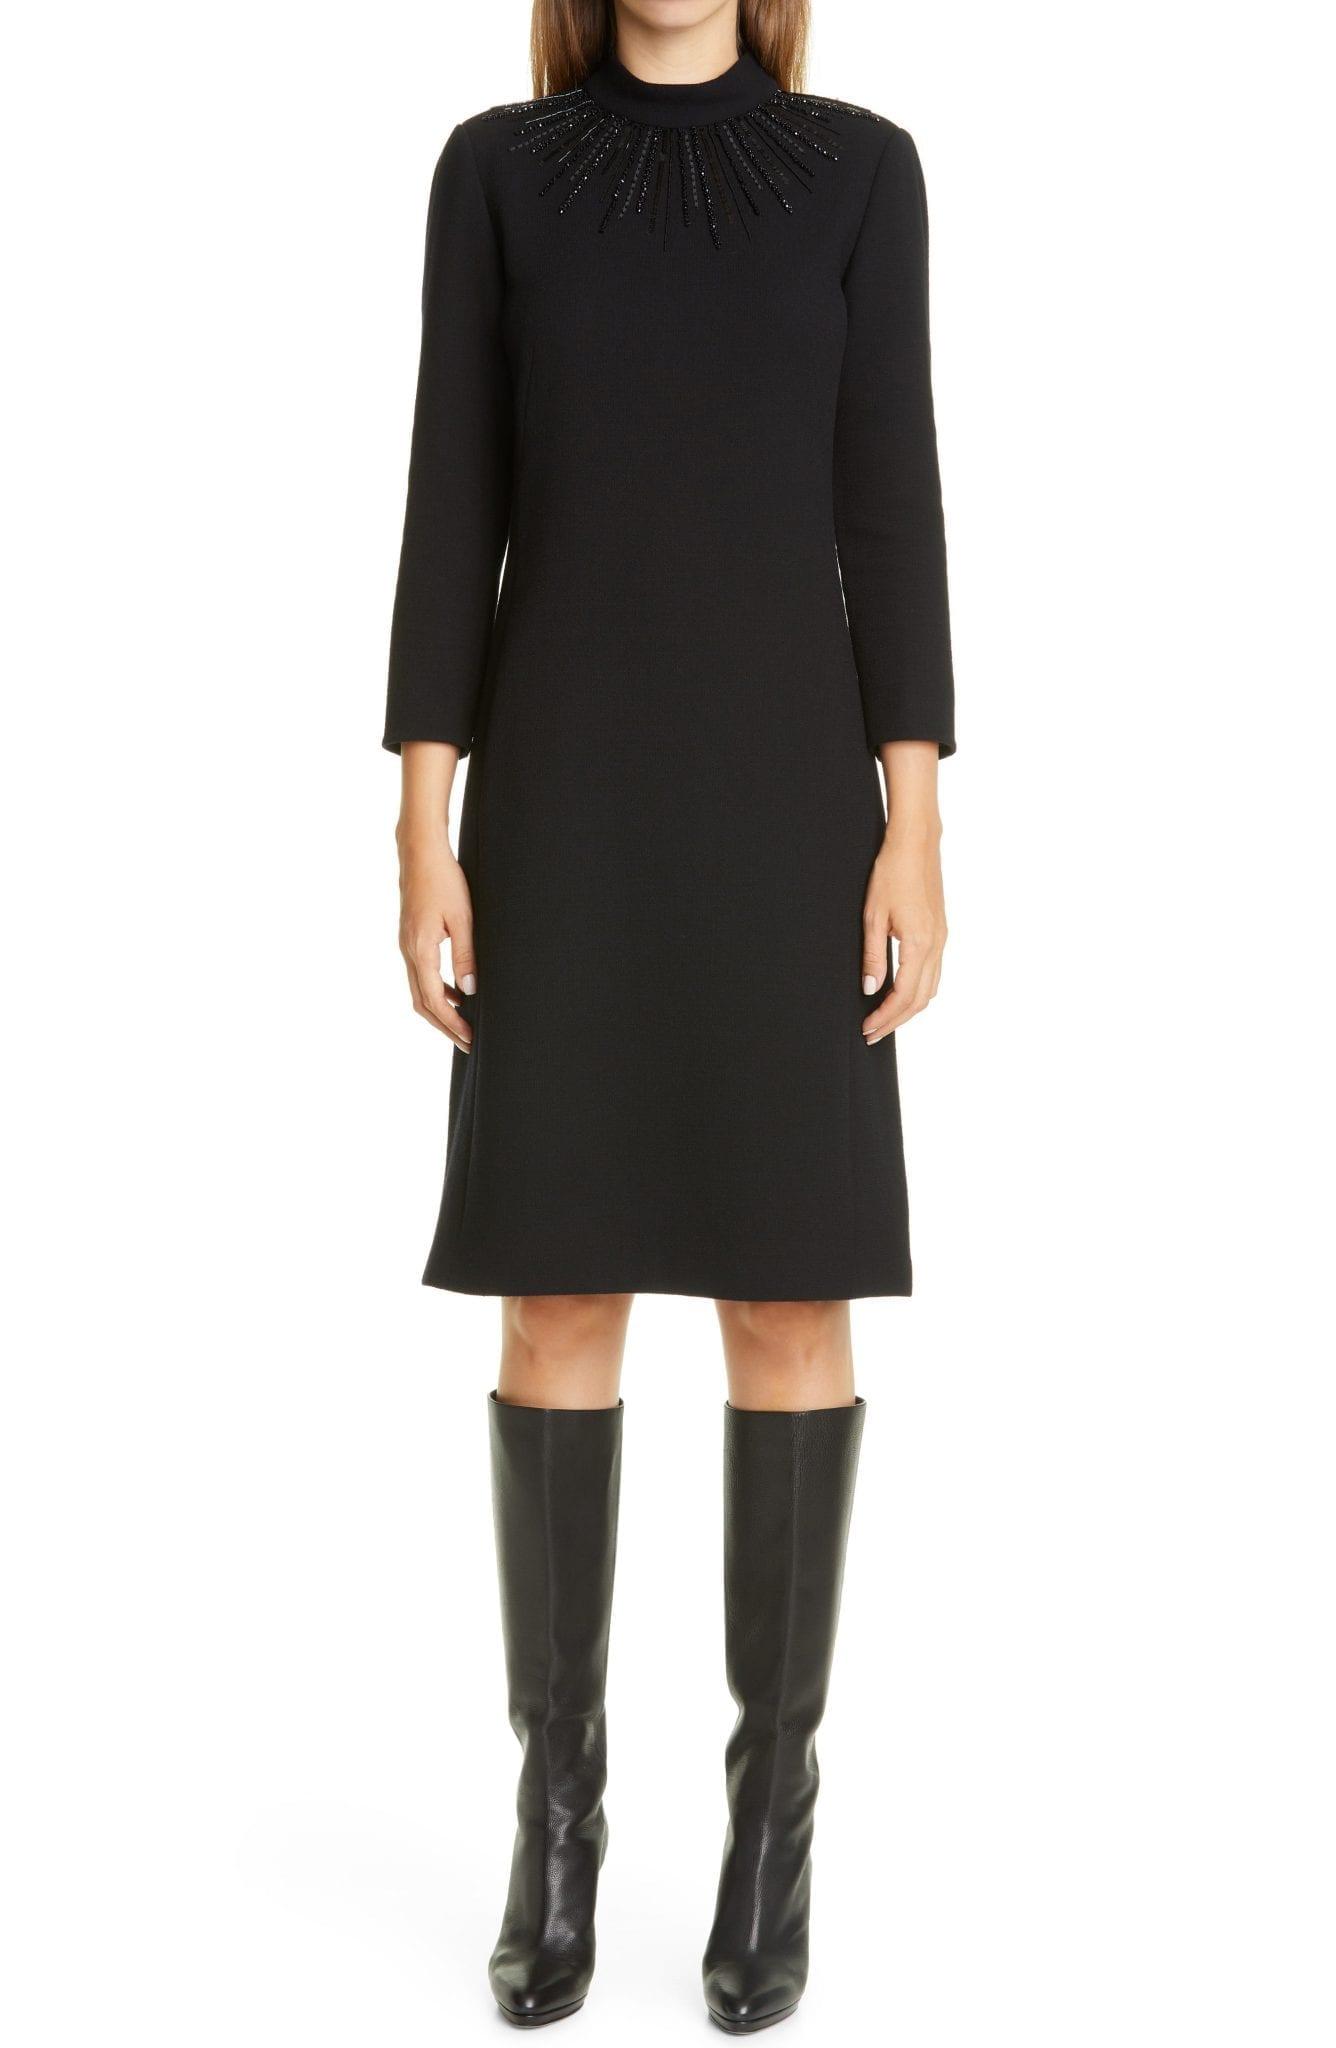 LAFAYETTE 148 NEW YORK Adira Embellished Nouveau Wool Crepe A-Line Dress